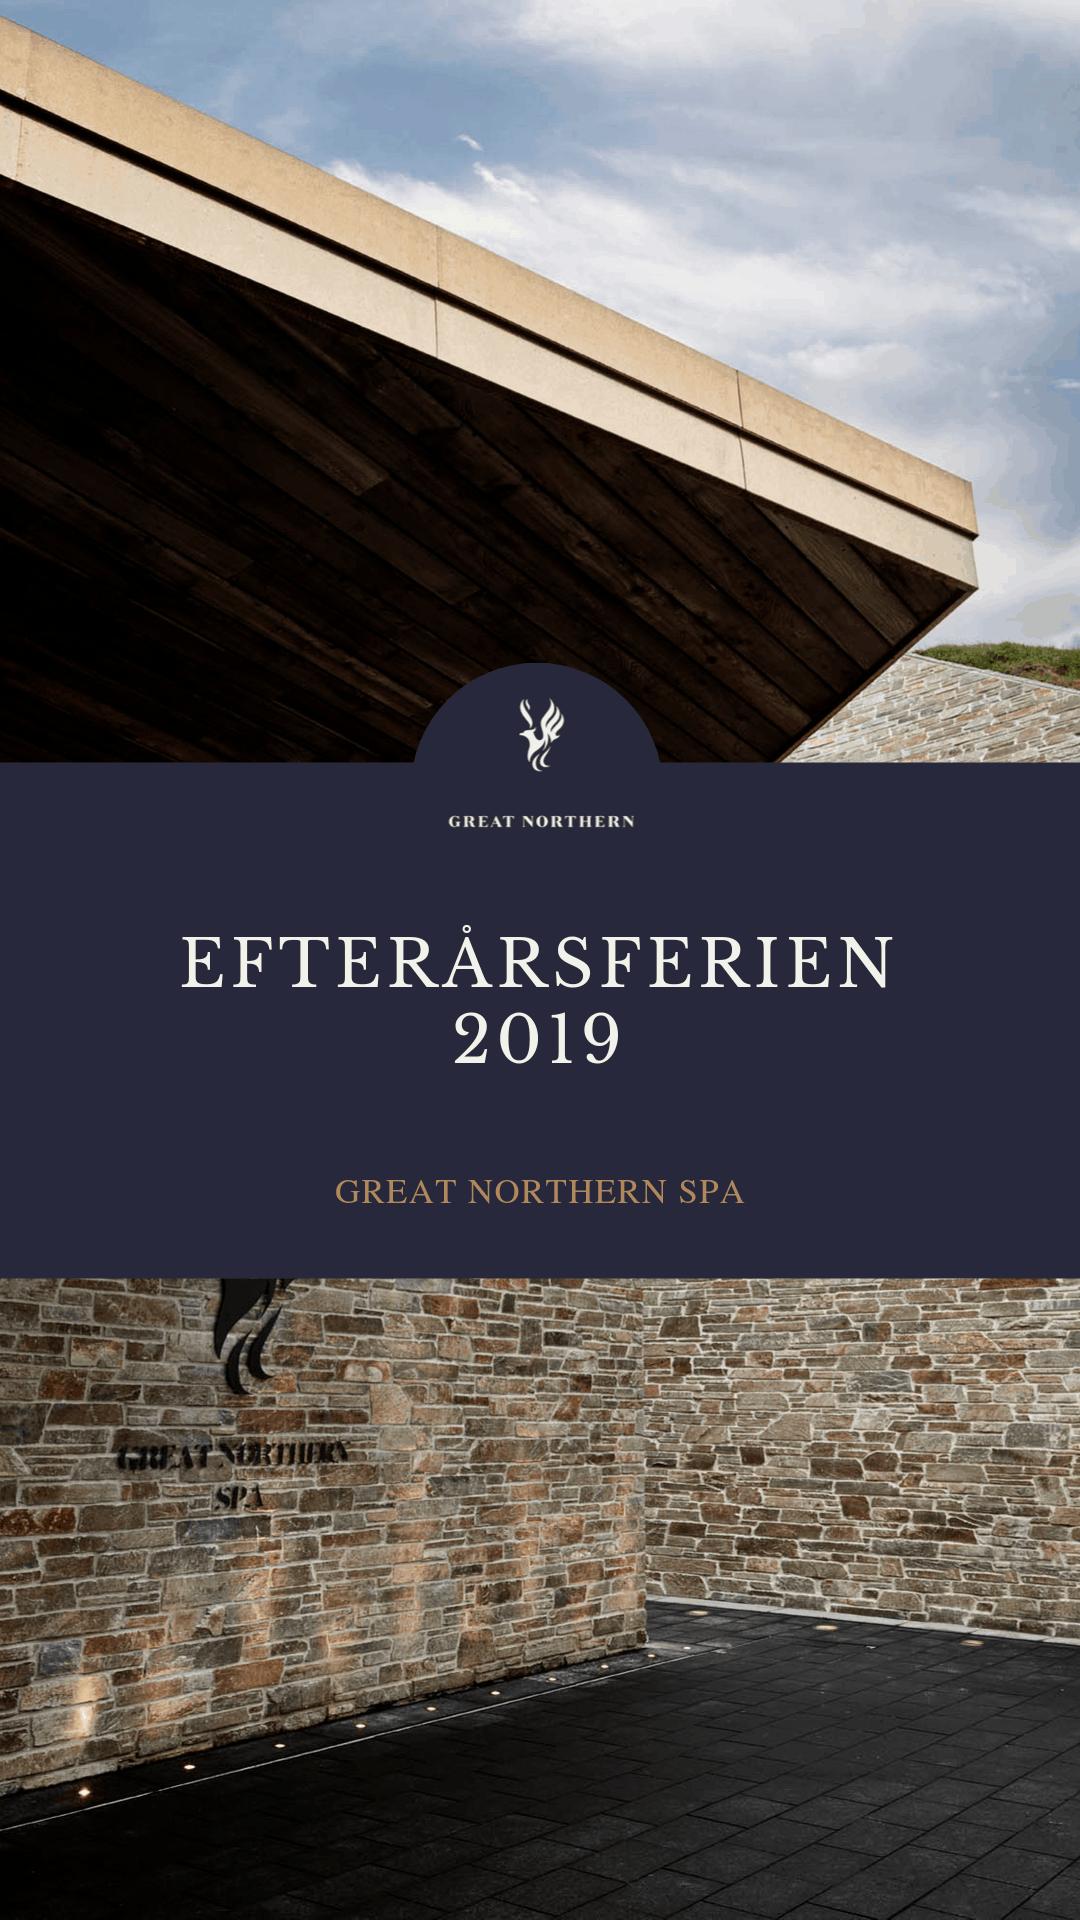 EFTERÅRSFERIEN 2019